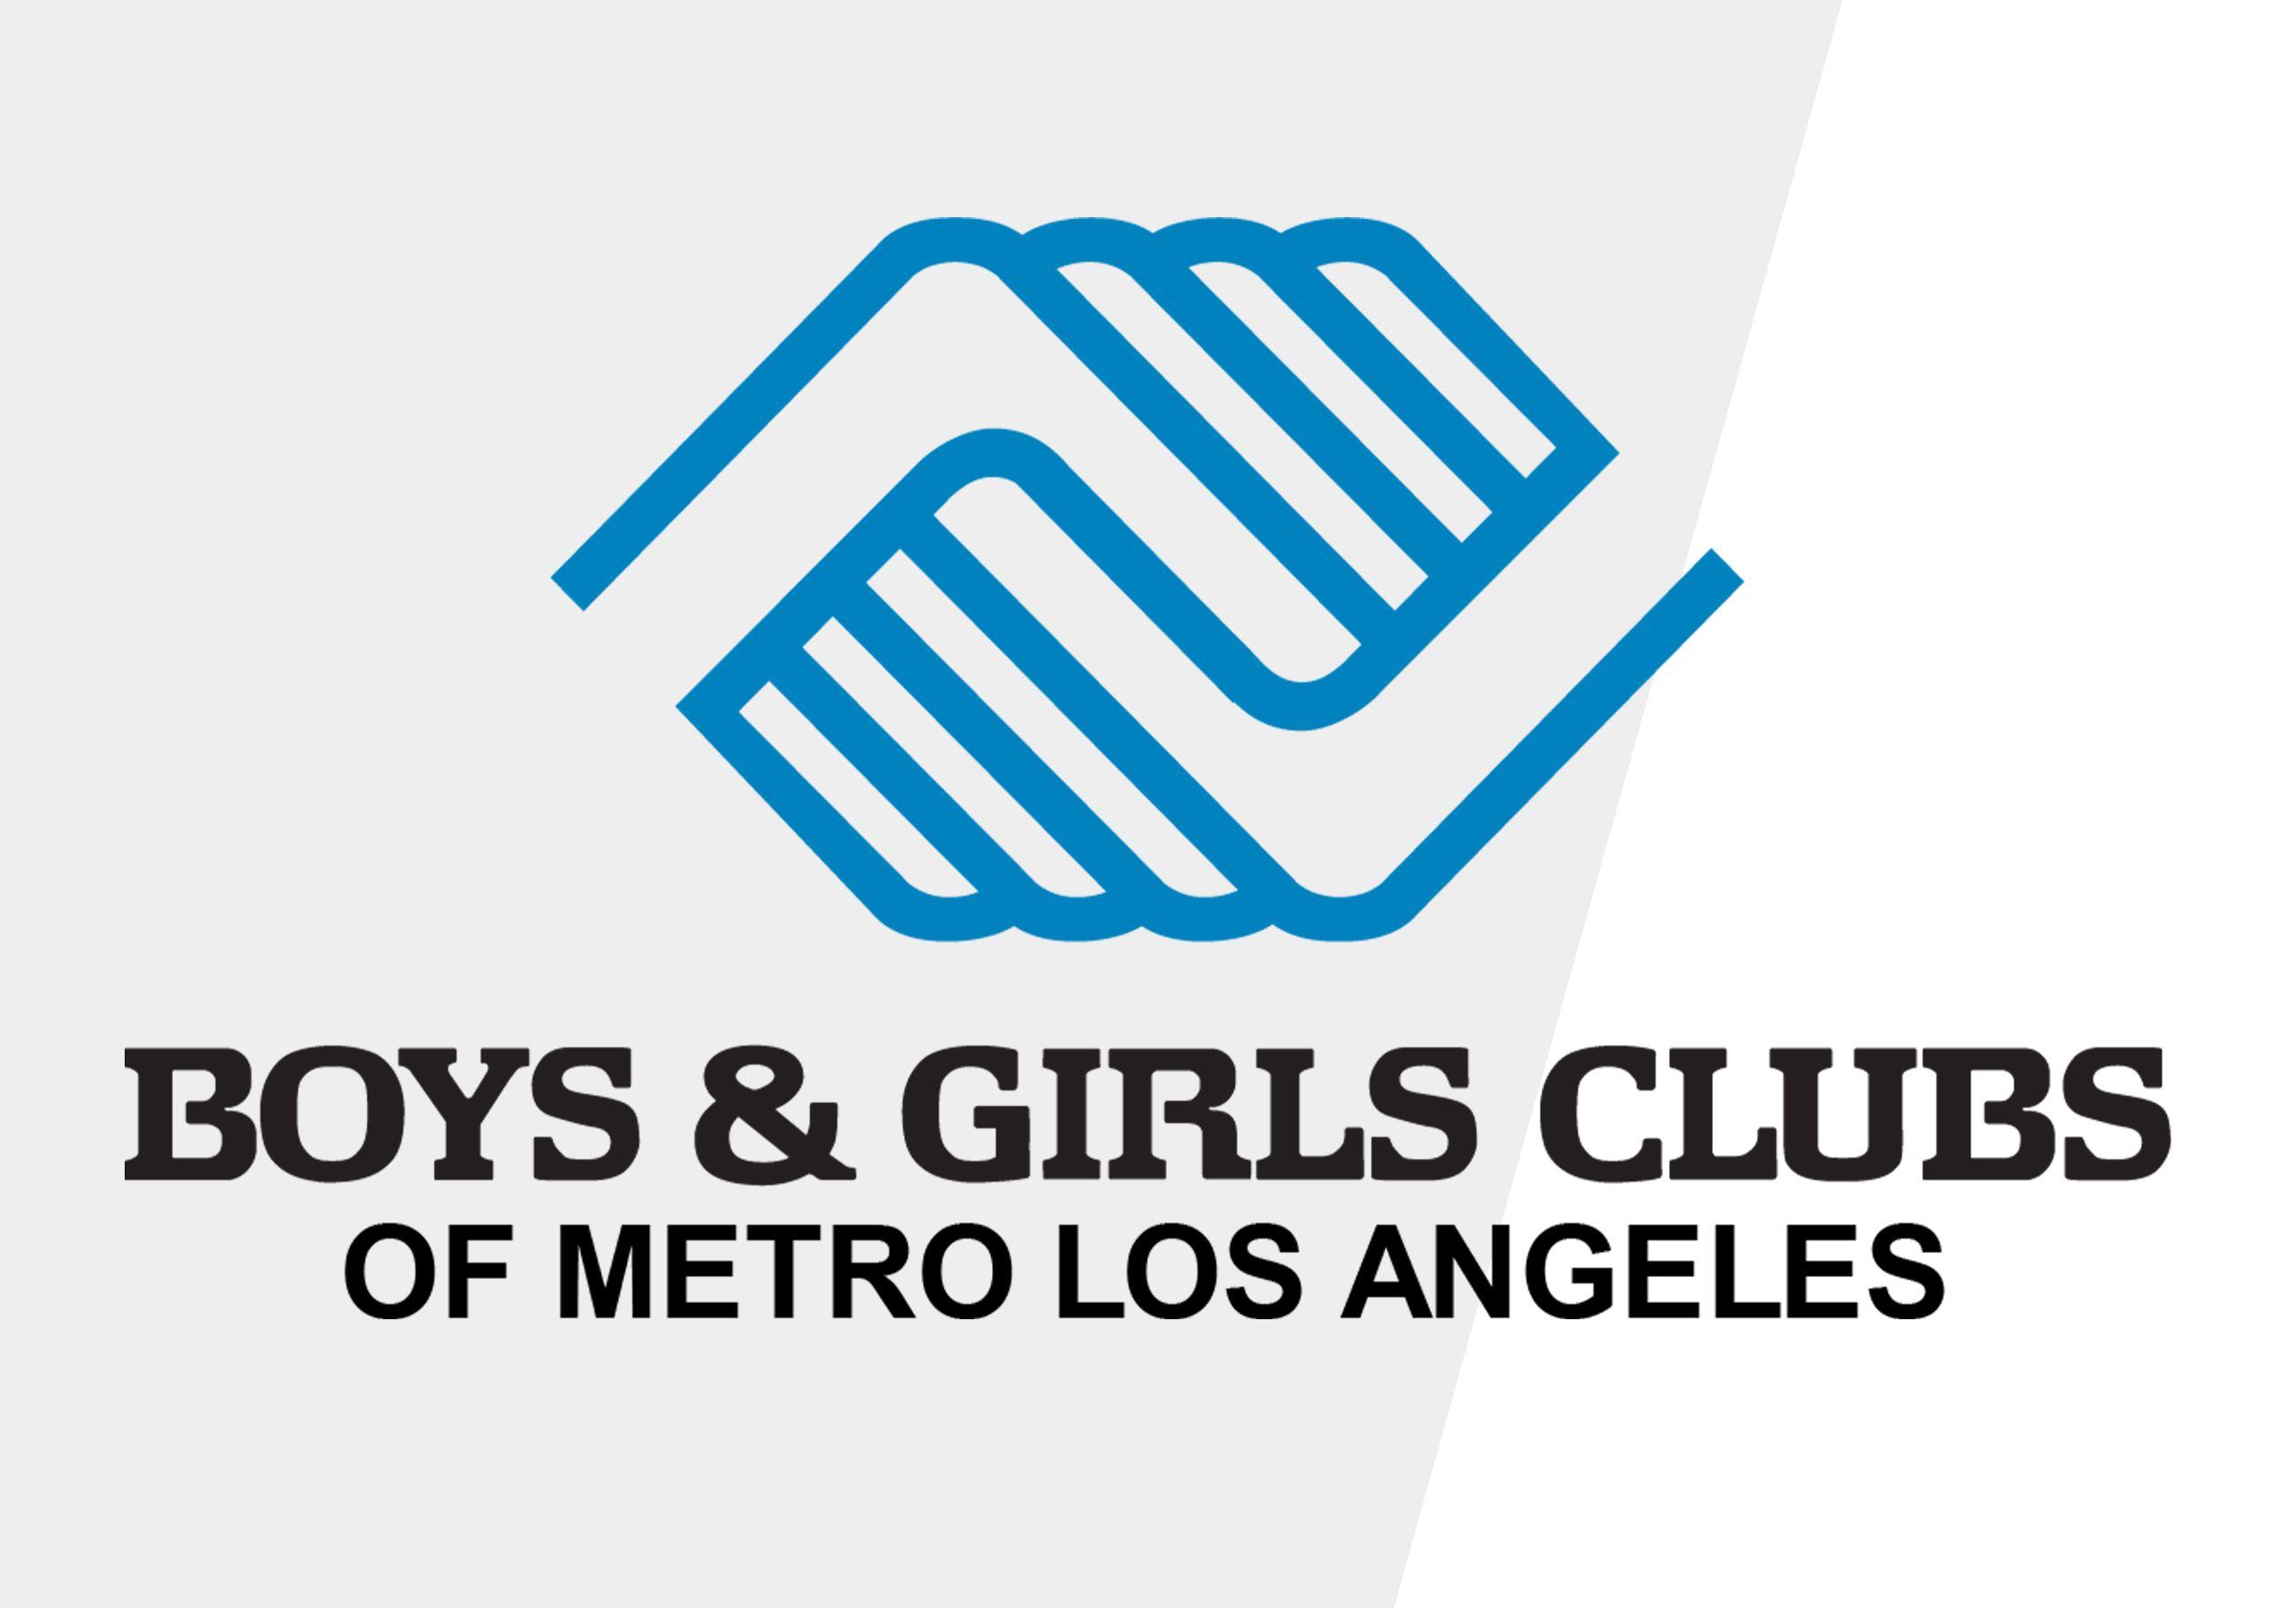 Boys & Girls Clubs of Metro LA